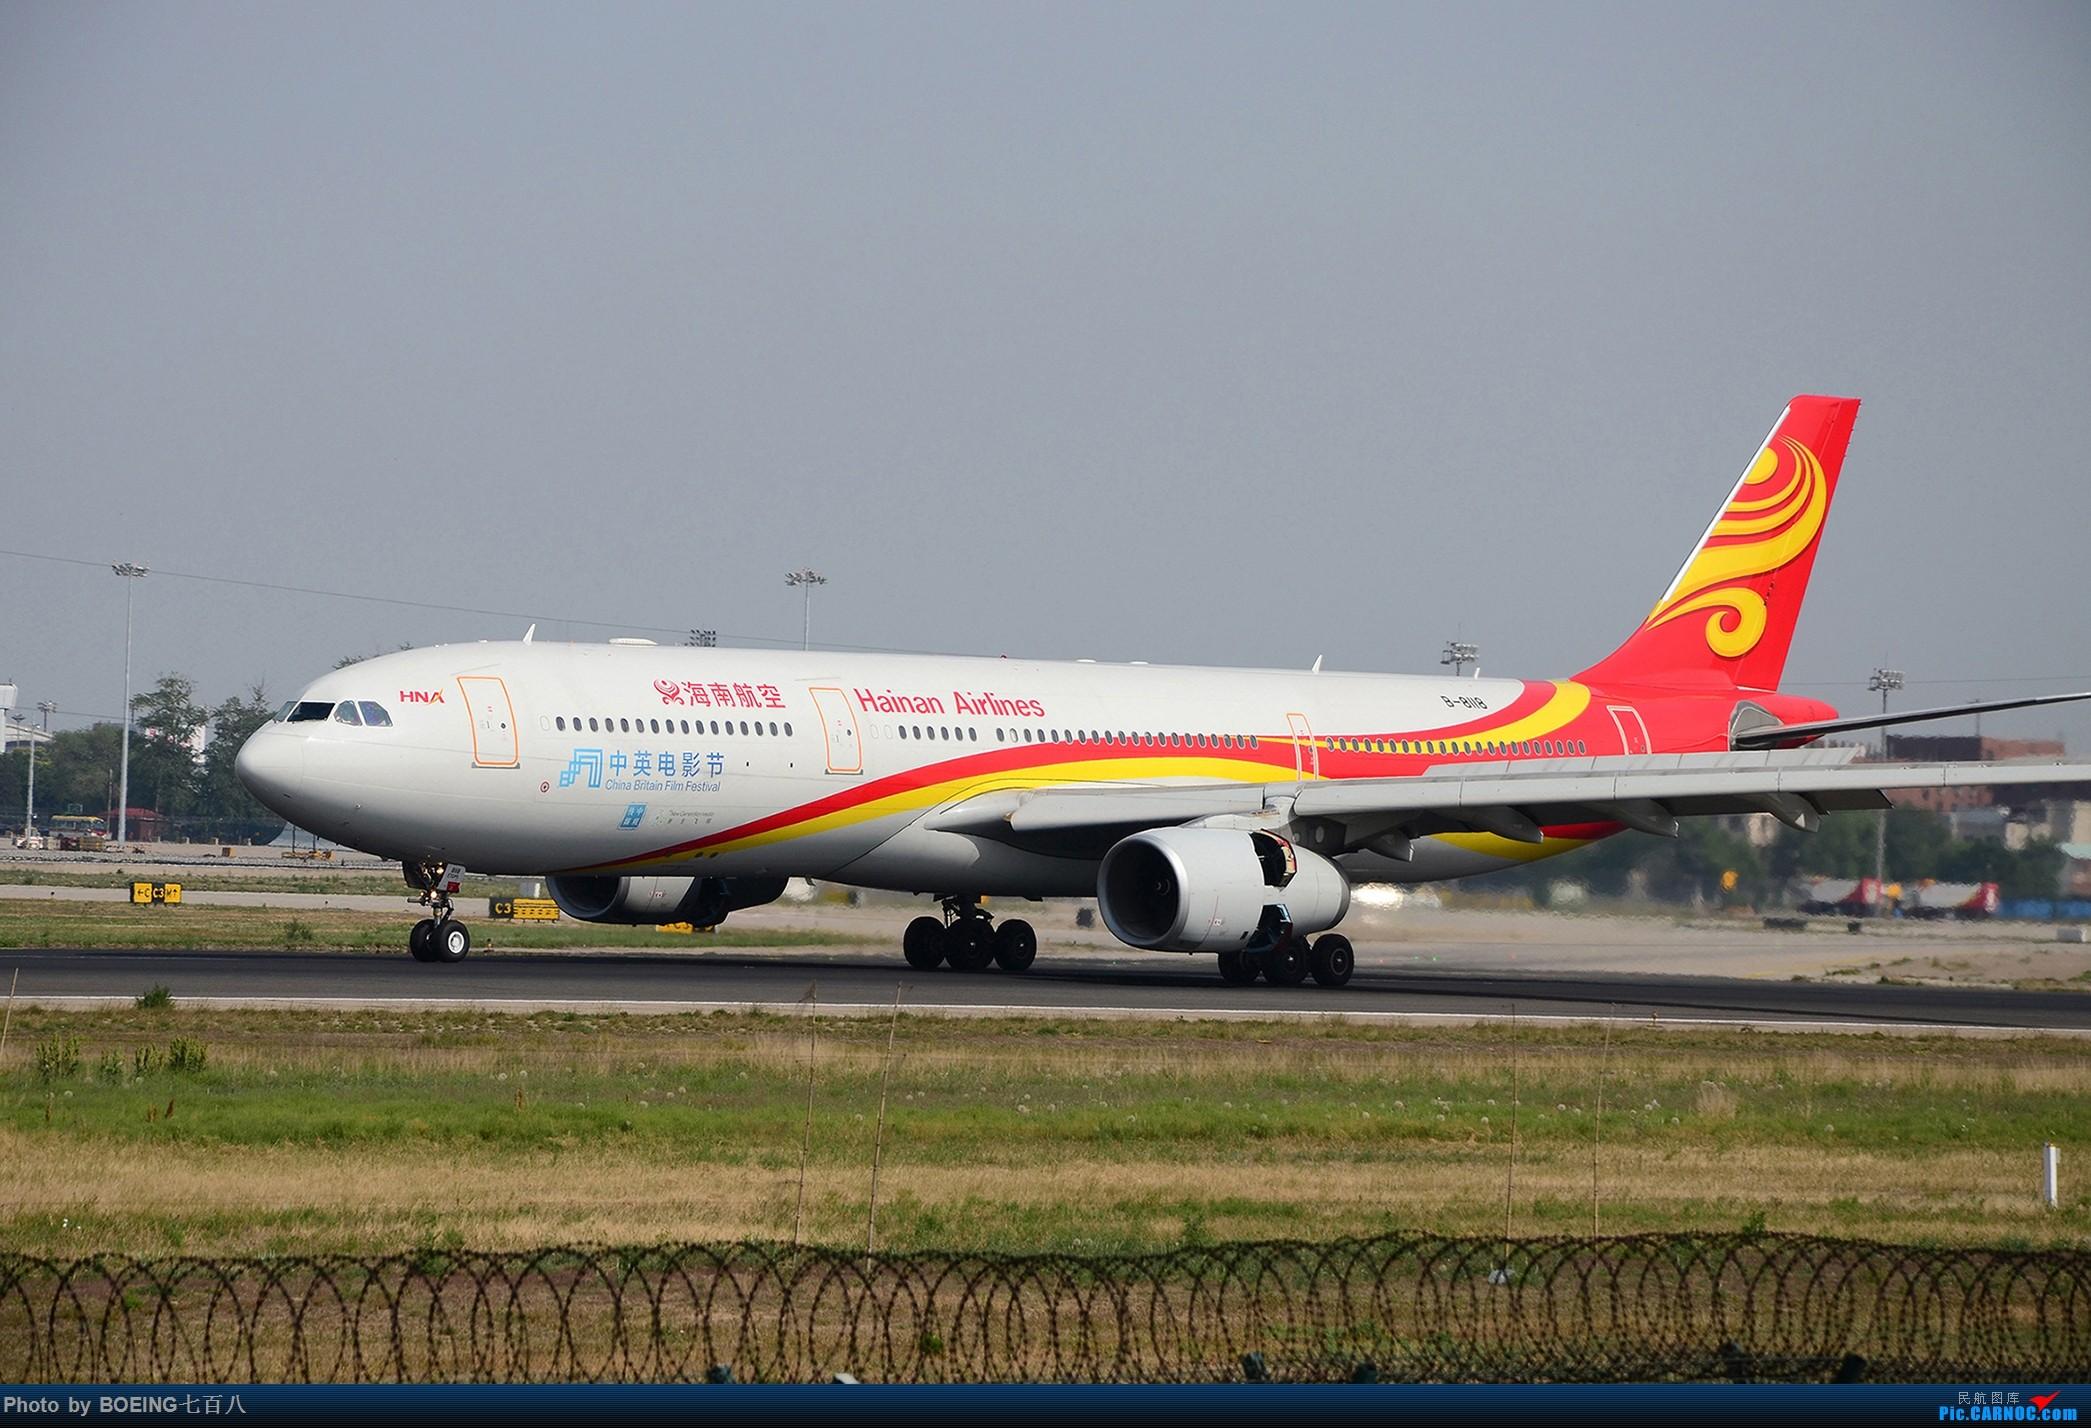 Re:[原创]海航家的黄焖熊猫和清蒸熊猫等好货 AIRBUS A330-300 B-8118 中国北京首都国际机场